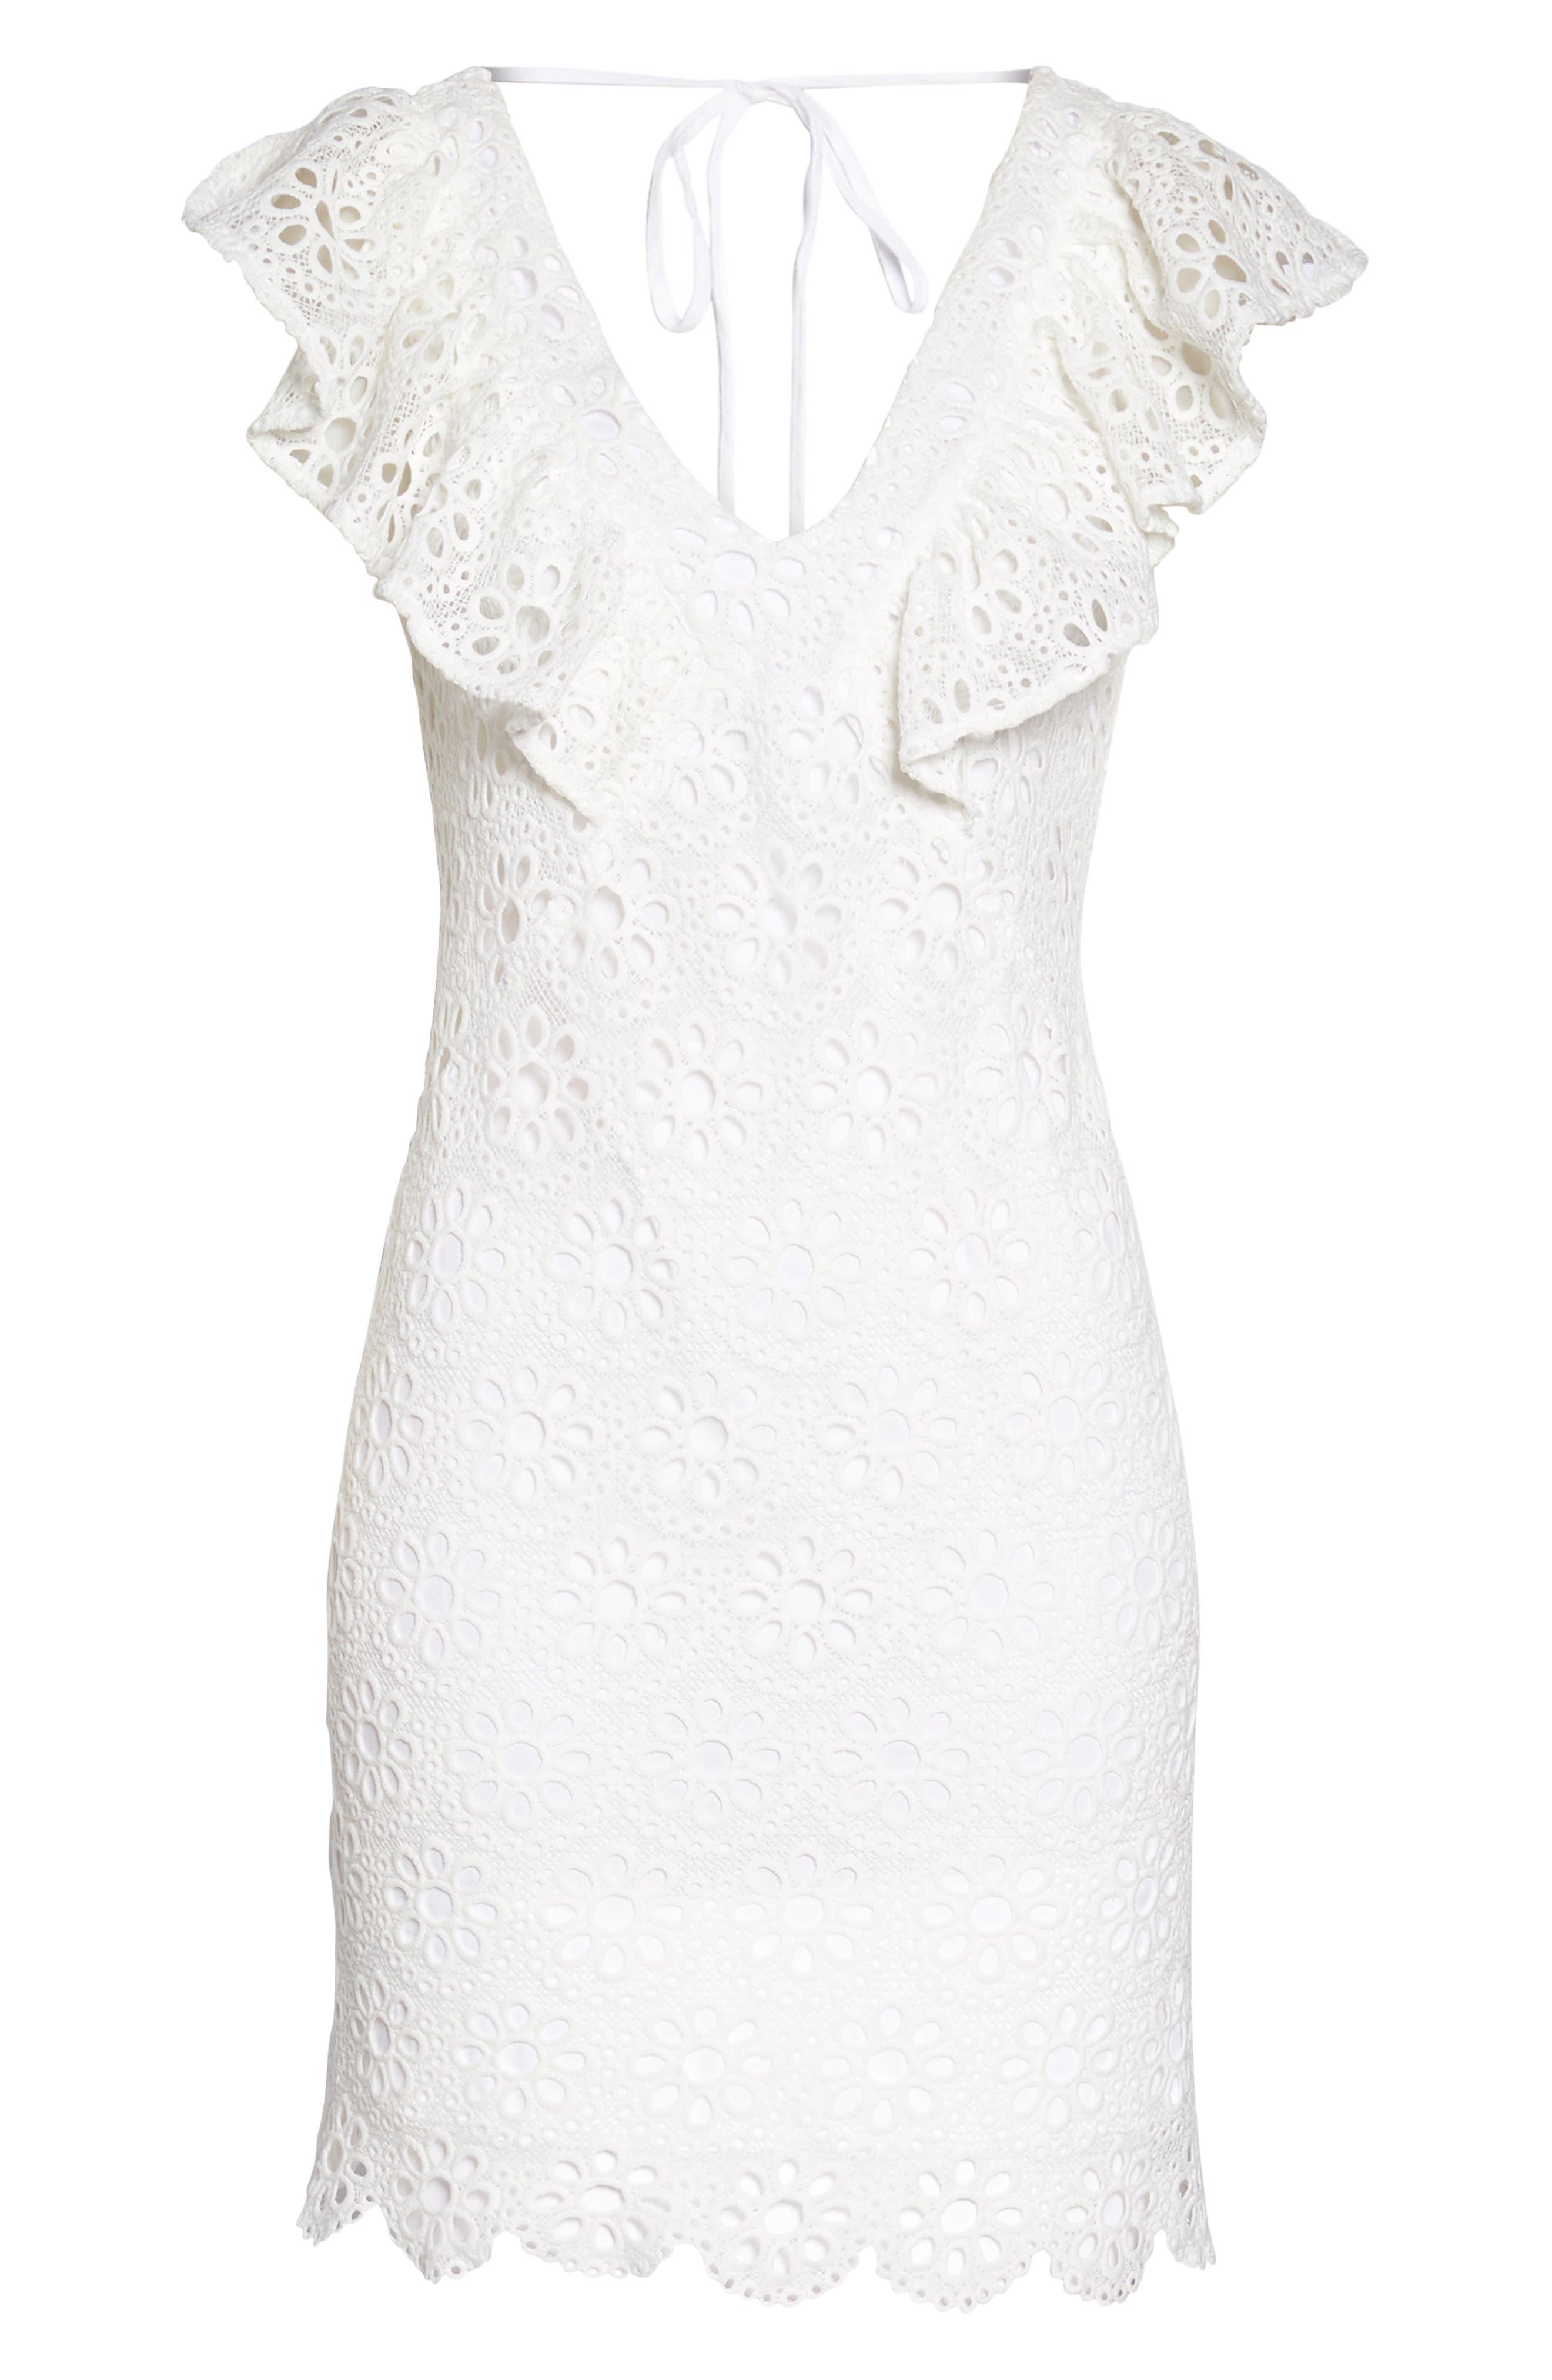 Neriah Eyelet Embroidered Dress,                             Alternate thumbnail 7, color,                             131